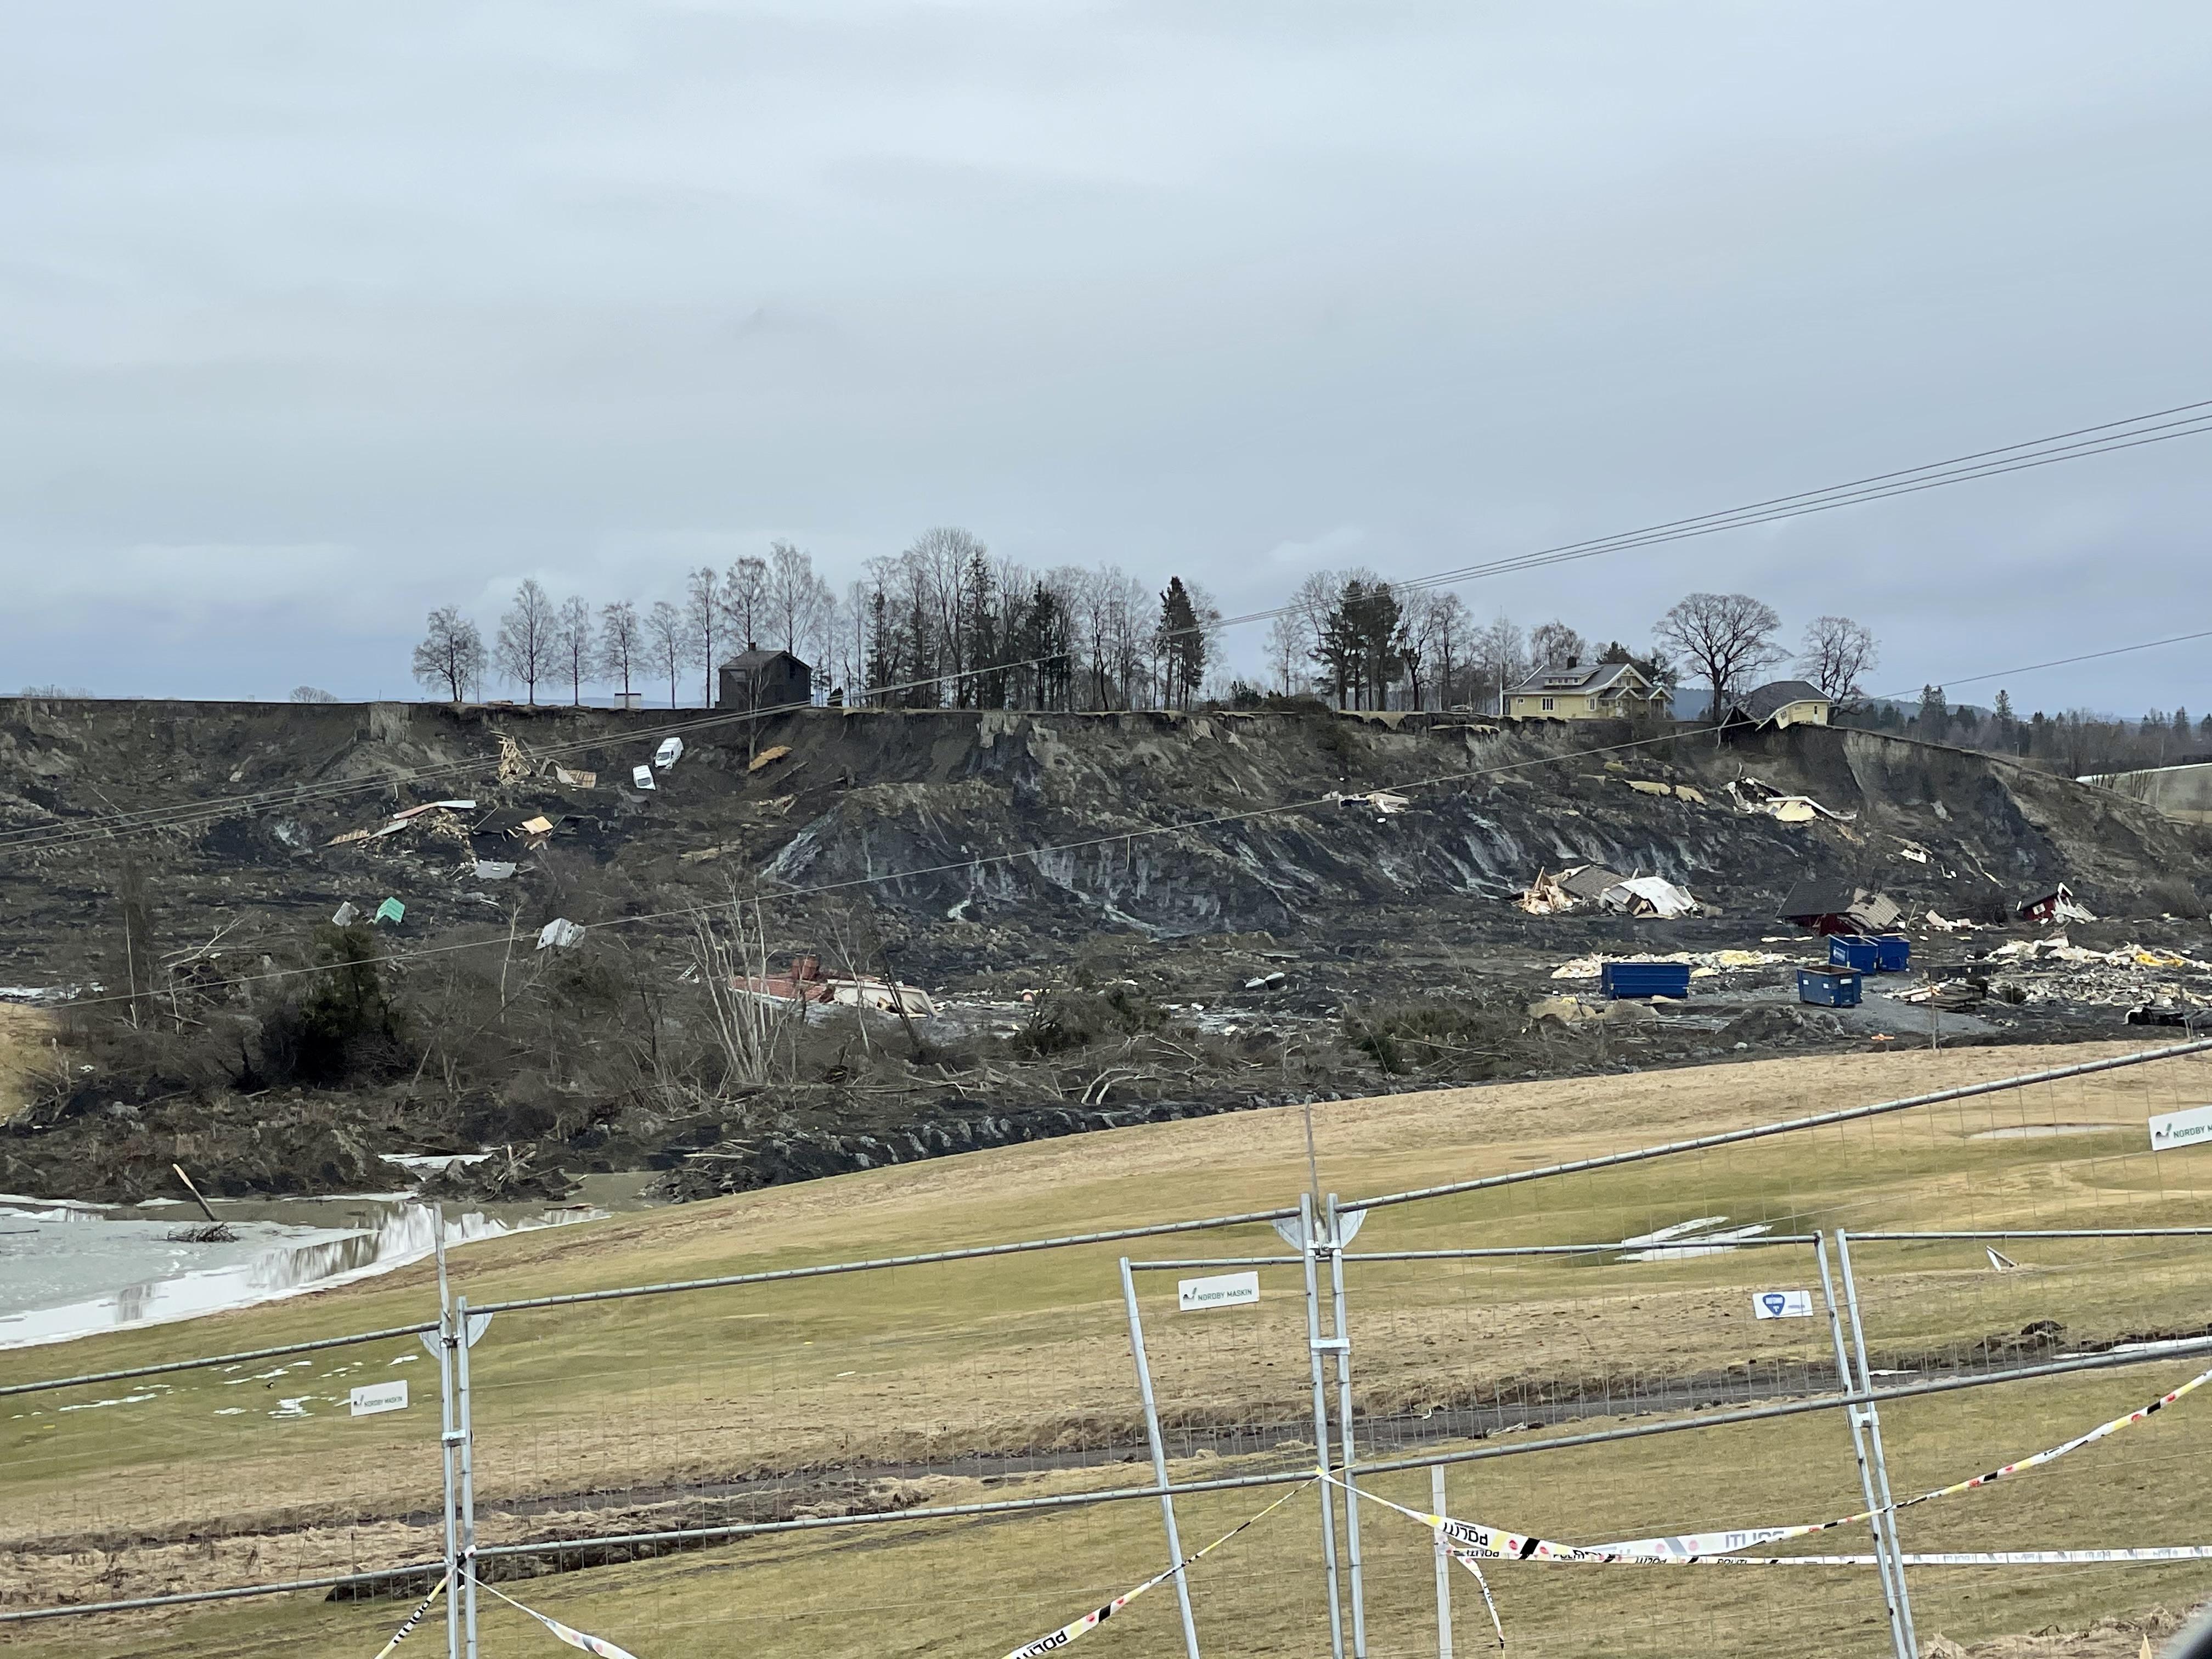 Slik bidro Tomas renholdere i Gjerdrum-katastrofen